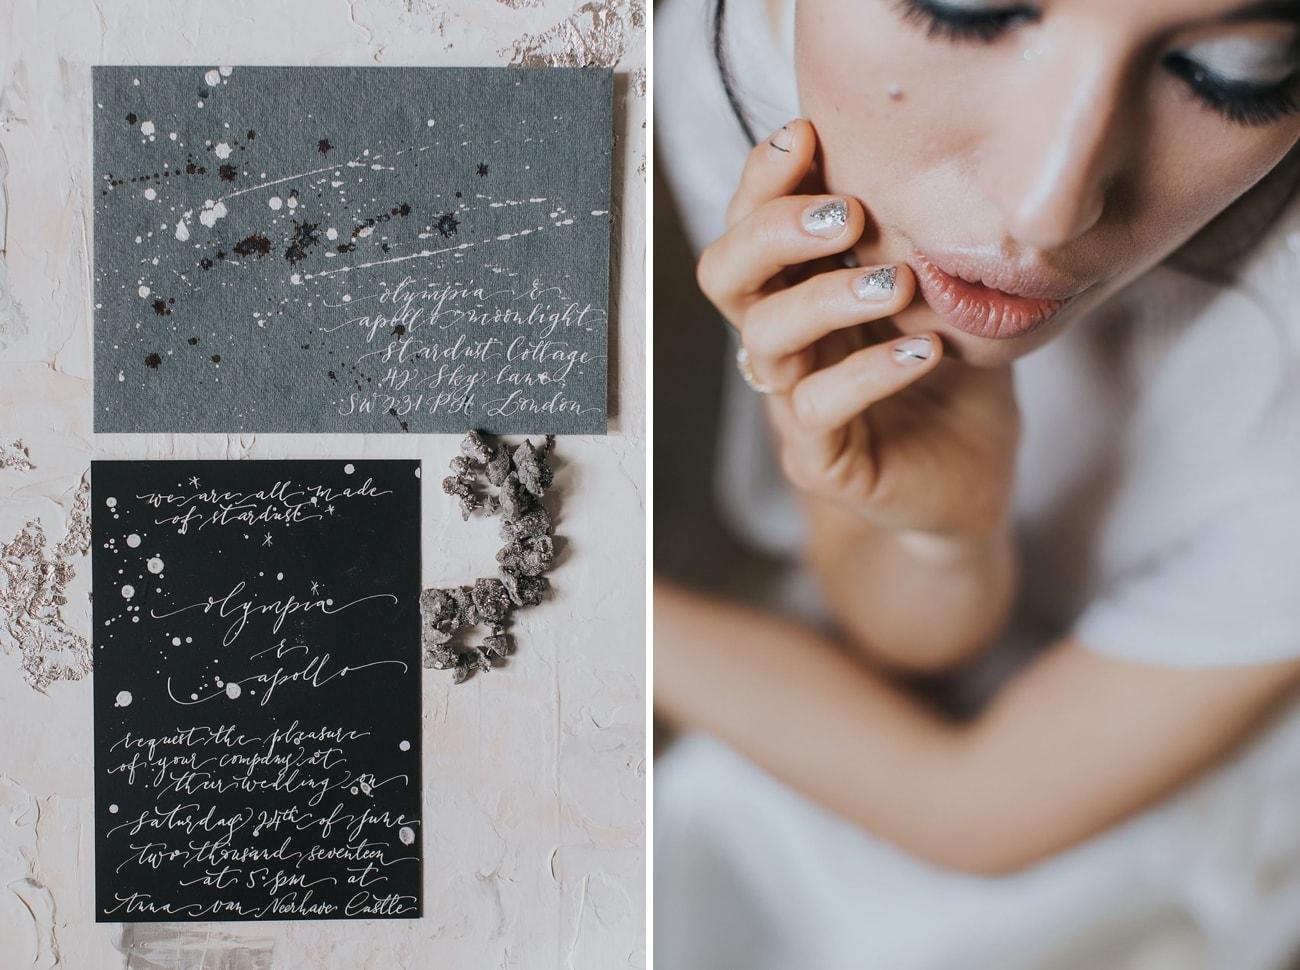 Star Themed Wedding Invitation | Credit: Cornelia Lietz